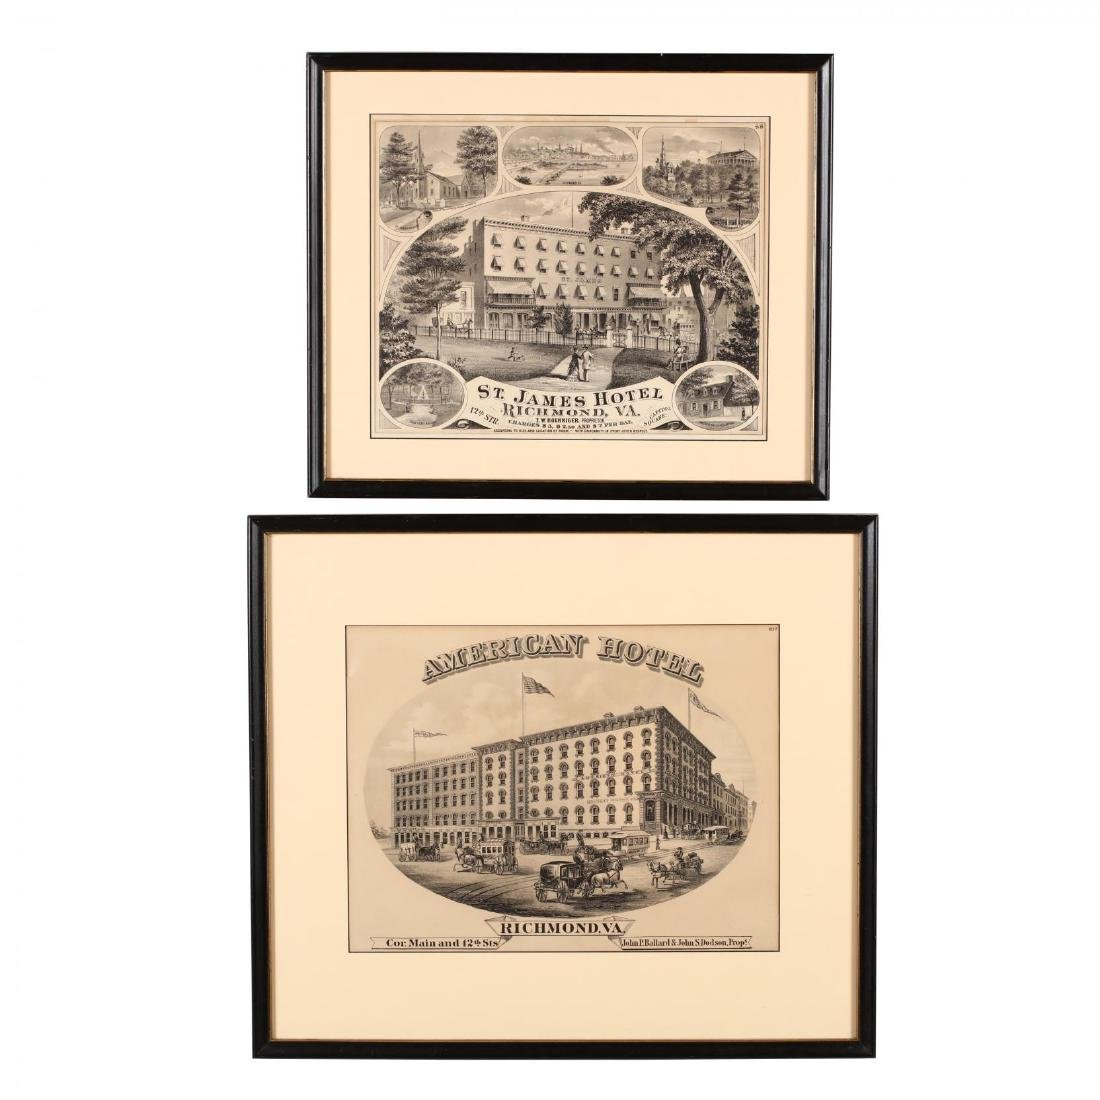 Two Antique Richmond, Virginia Hotel Advertisements